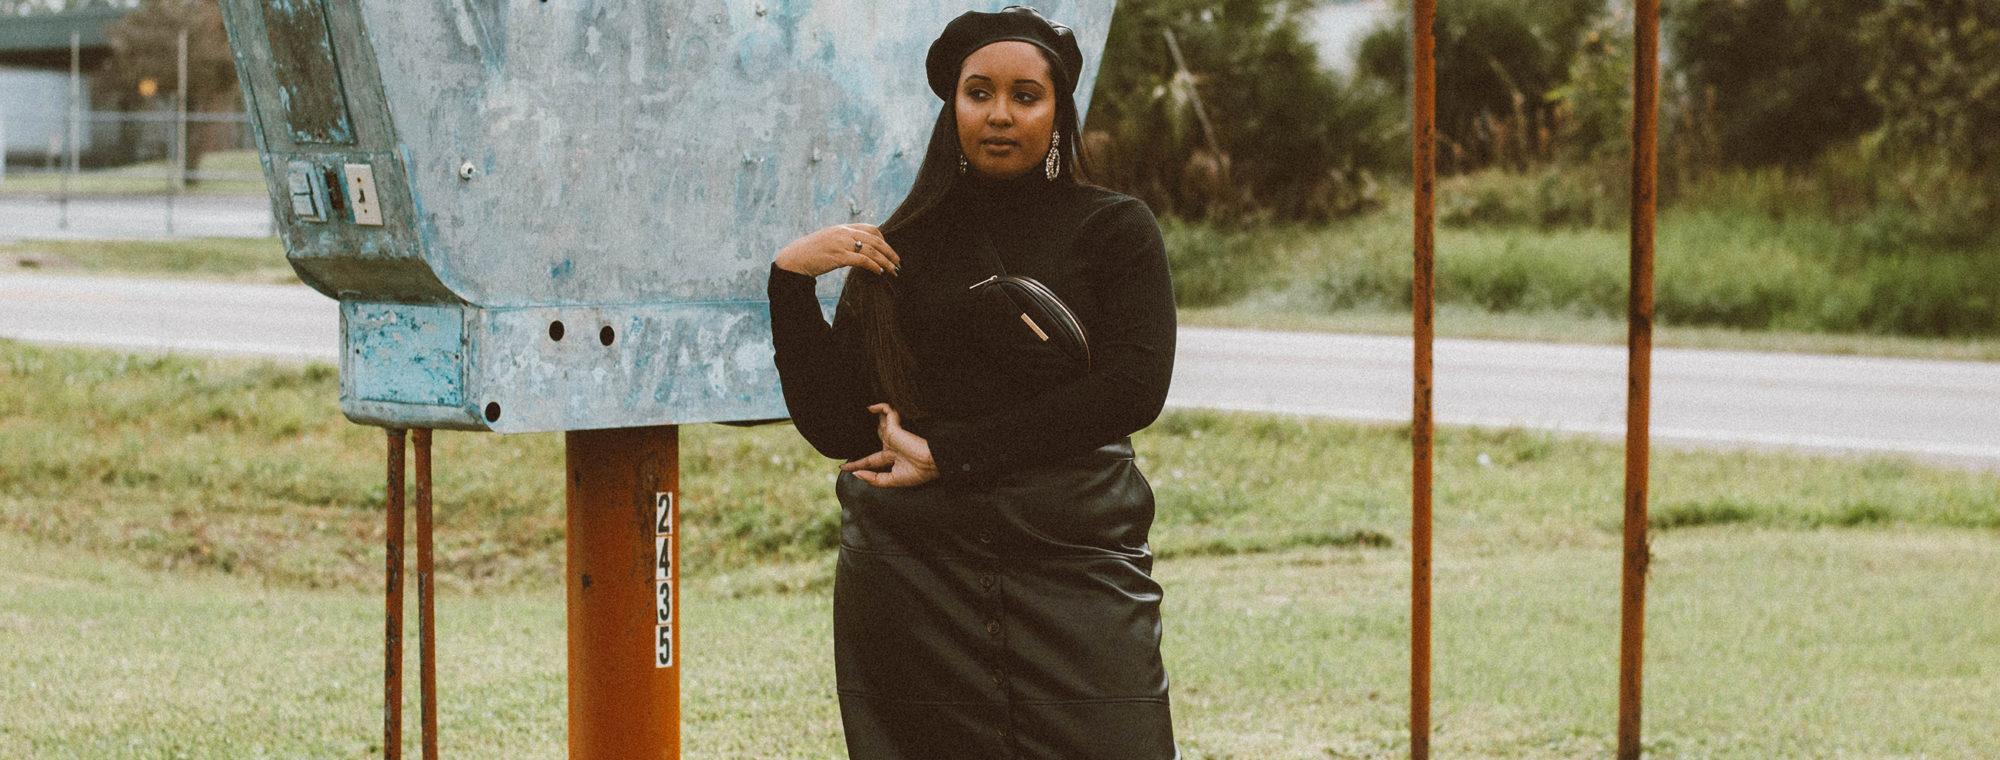 The Black Leather Midi Skirt